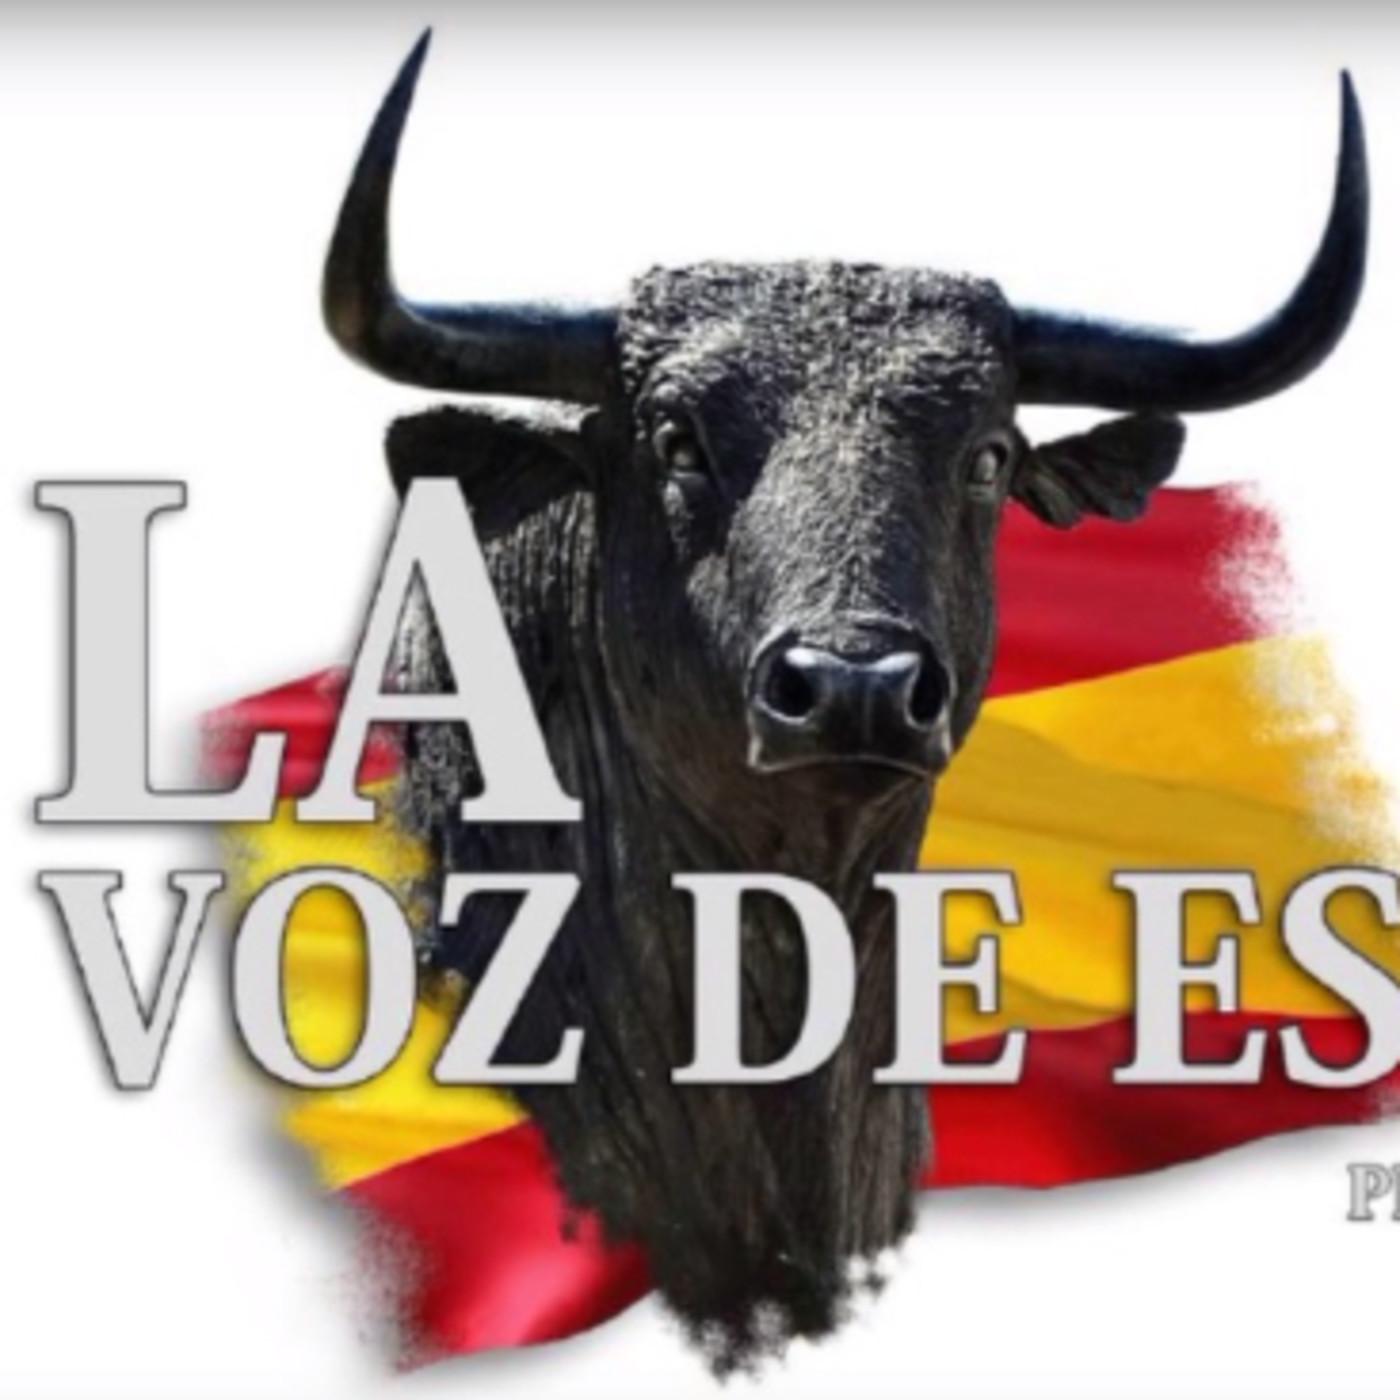 LA VOZ DE ESPAÑA Ed: 251 (24 de Junio)